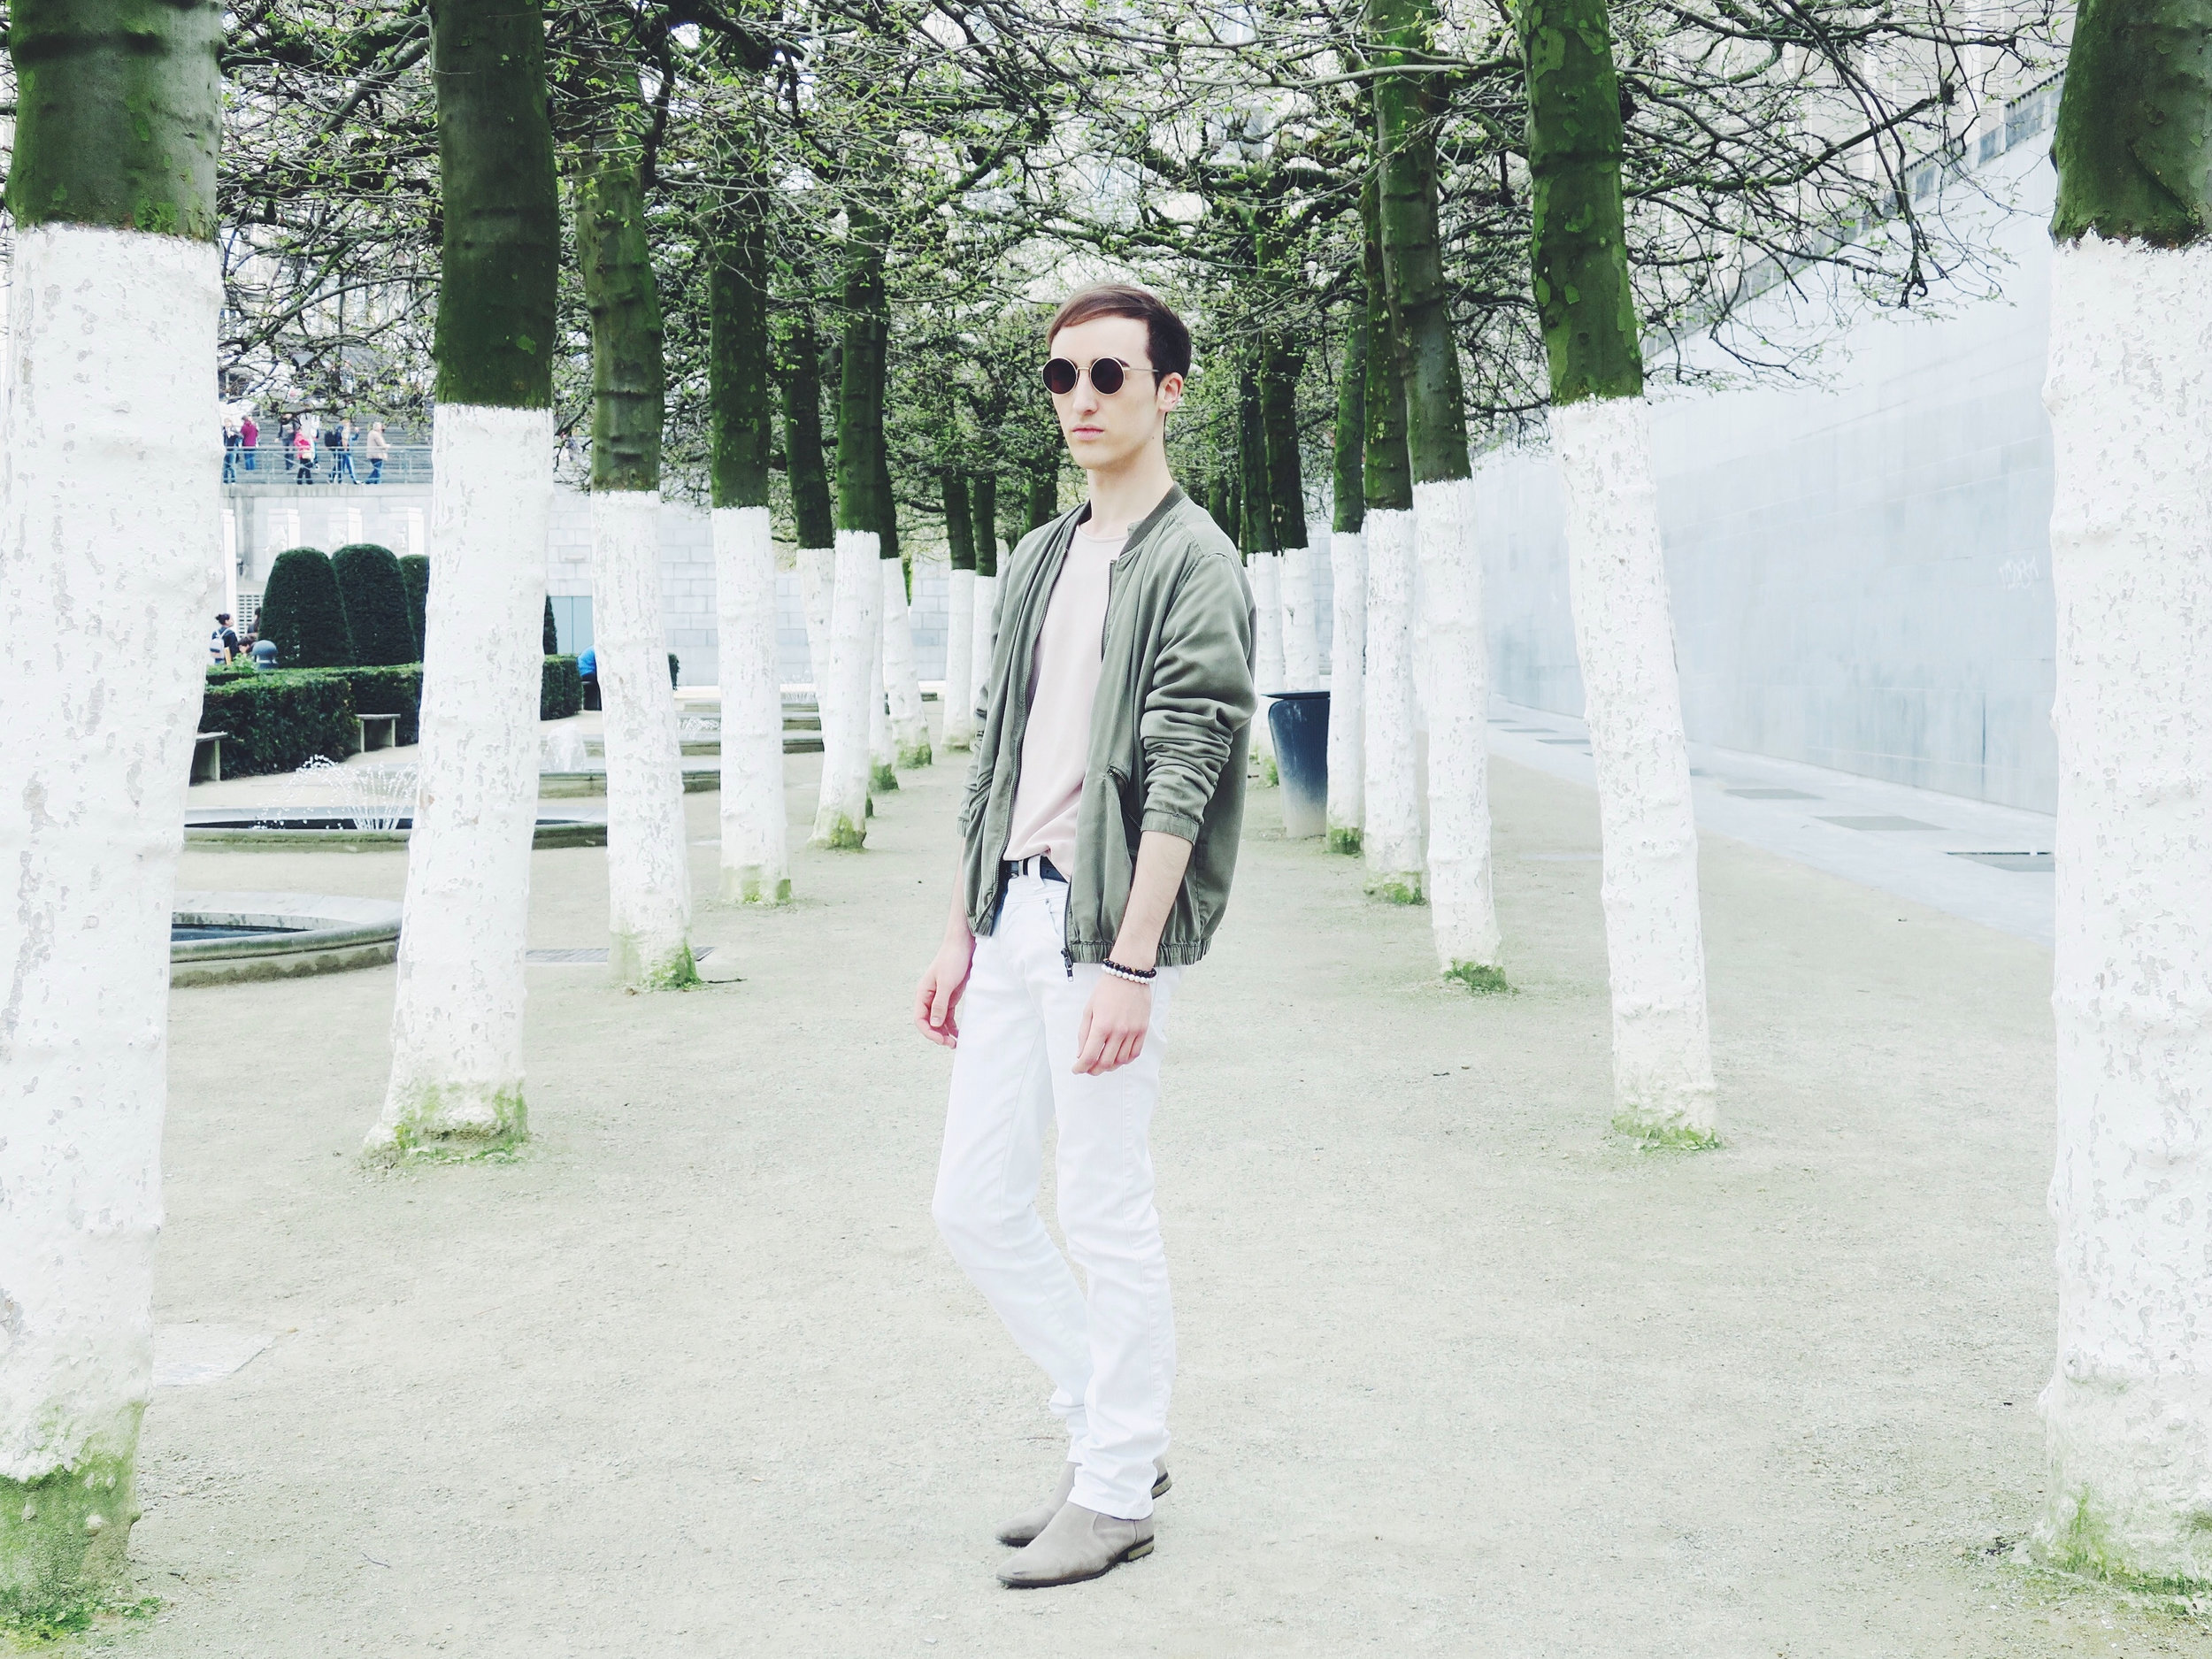 H&M jacket - Cos t-shirt - Zara trousers - Zign boots - Komono sunglasses